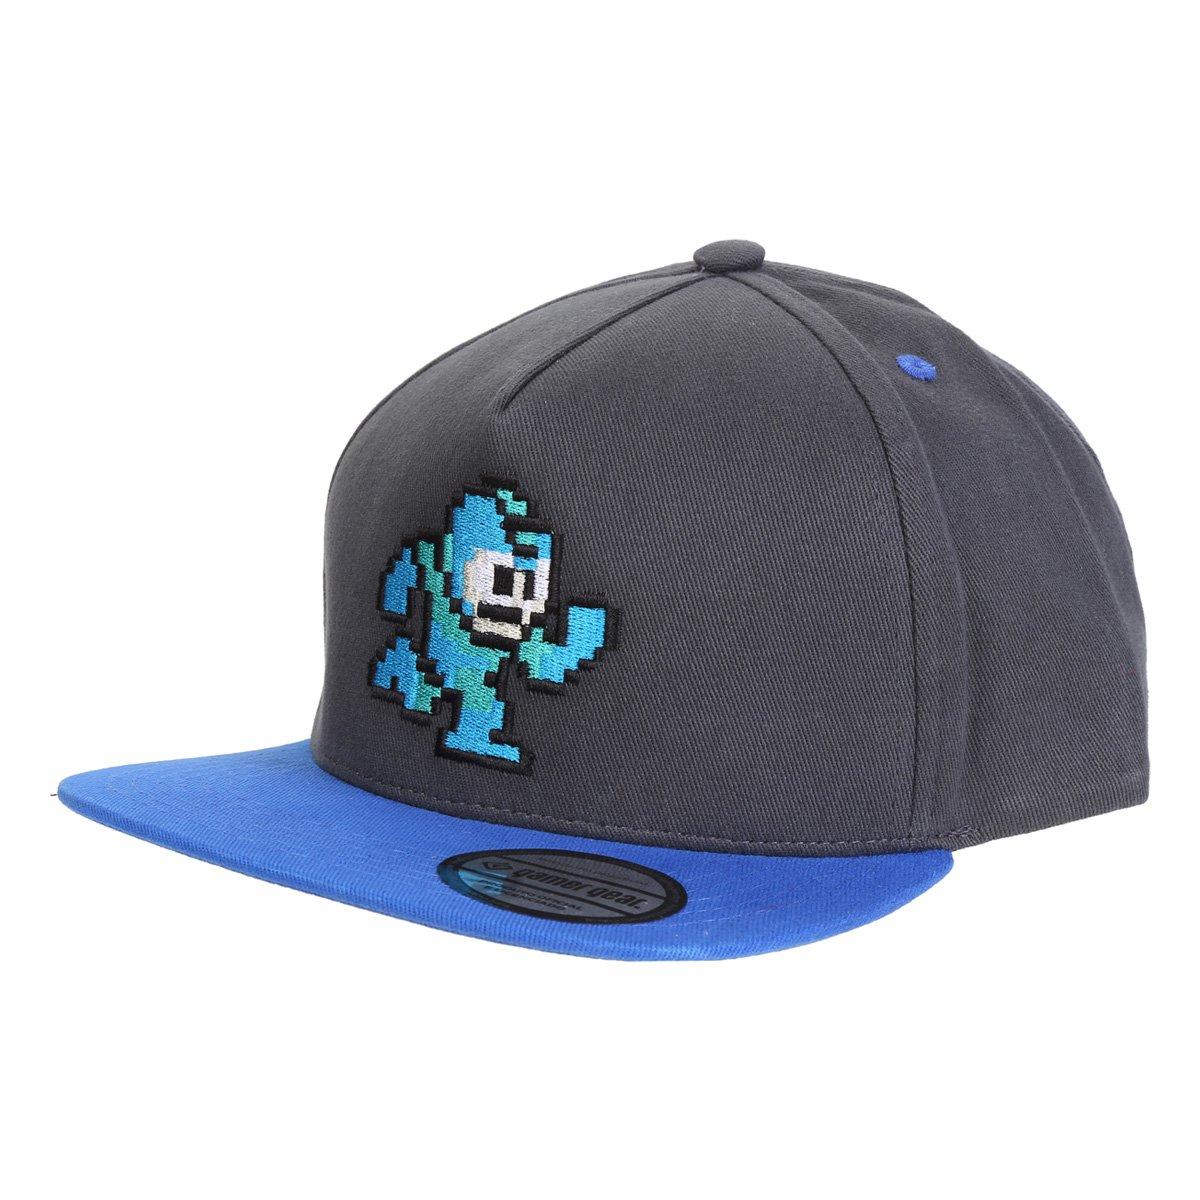 Boné Mega Man 8 Bits Aba Reta